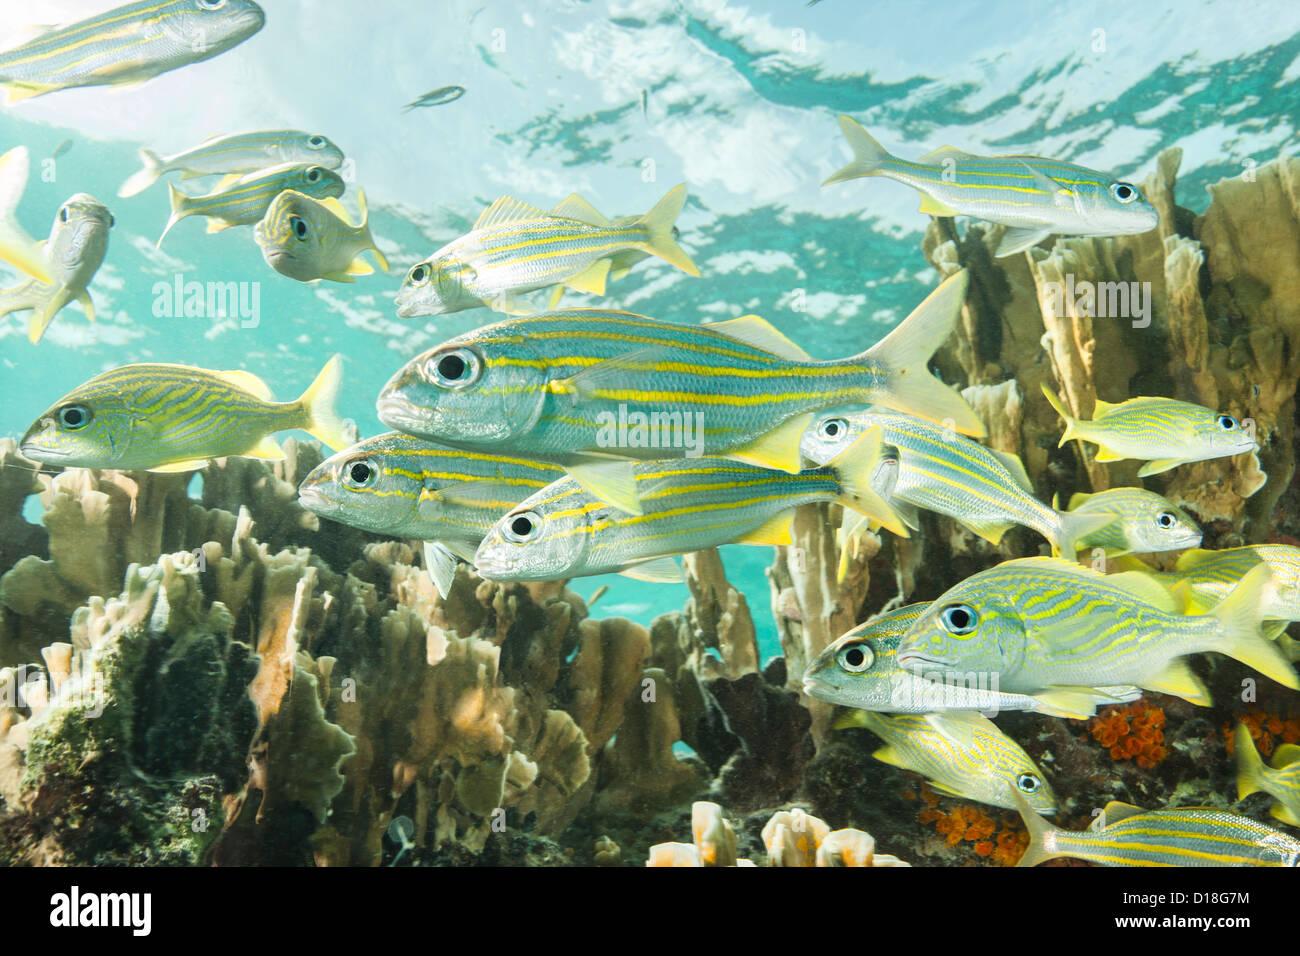 School of fish at underwater reef - Stock Image